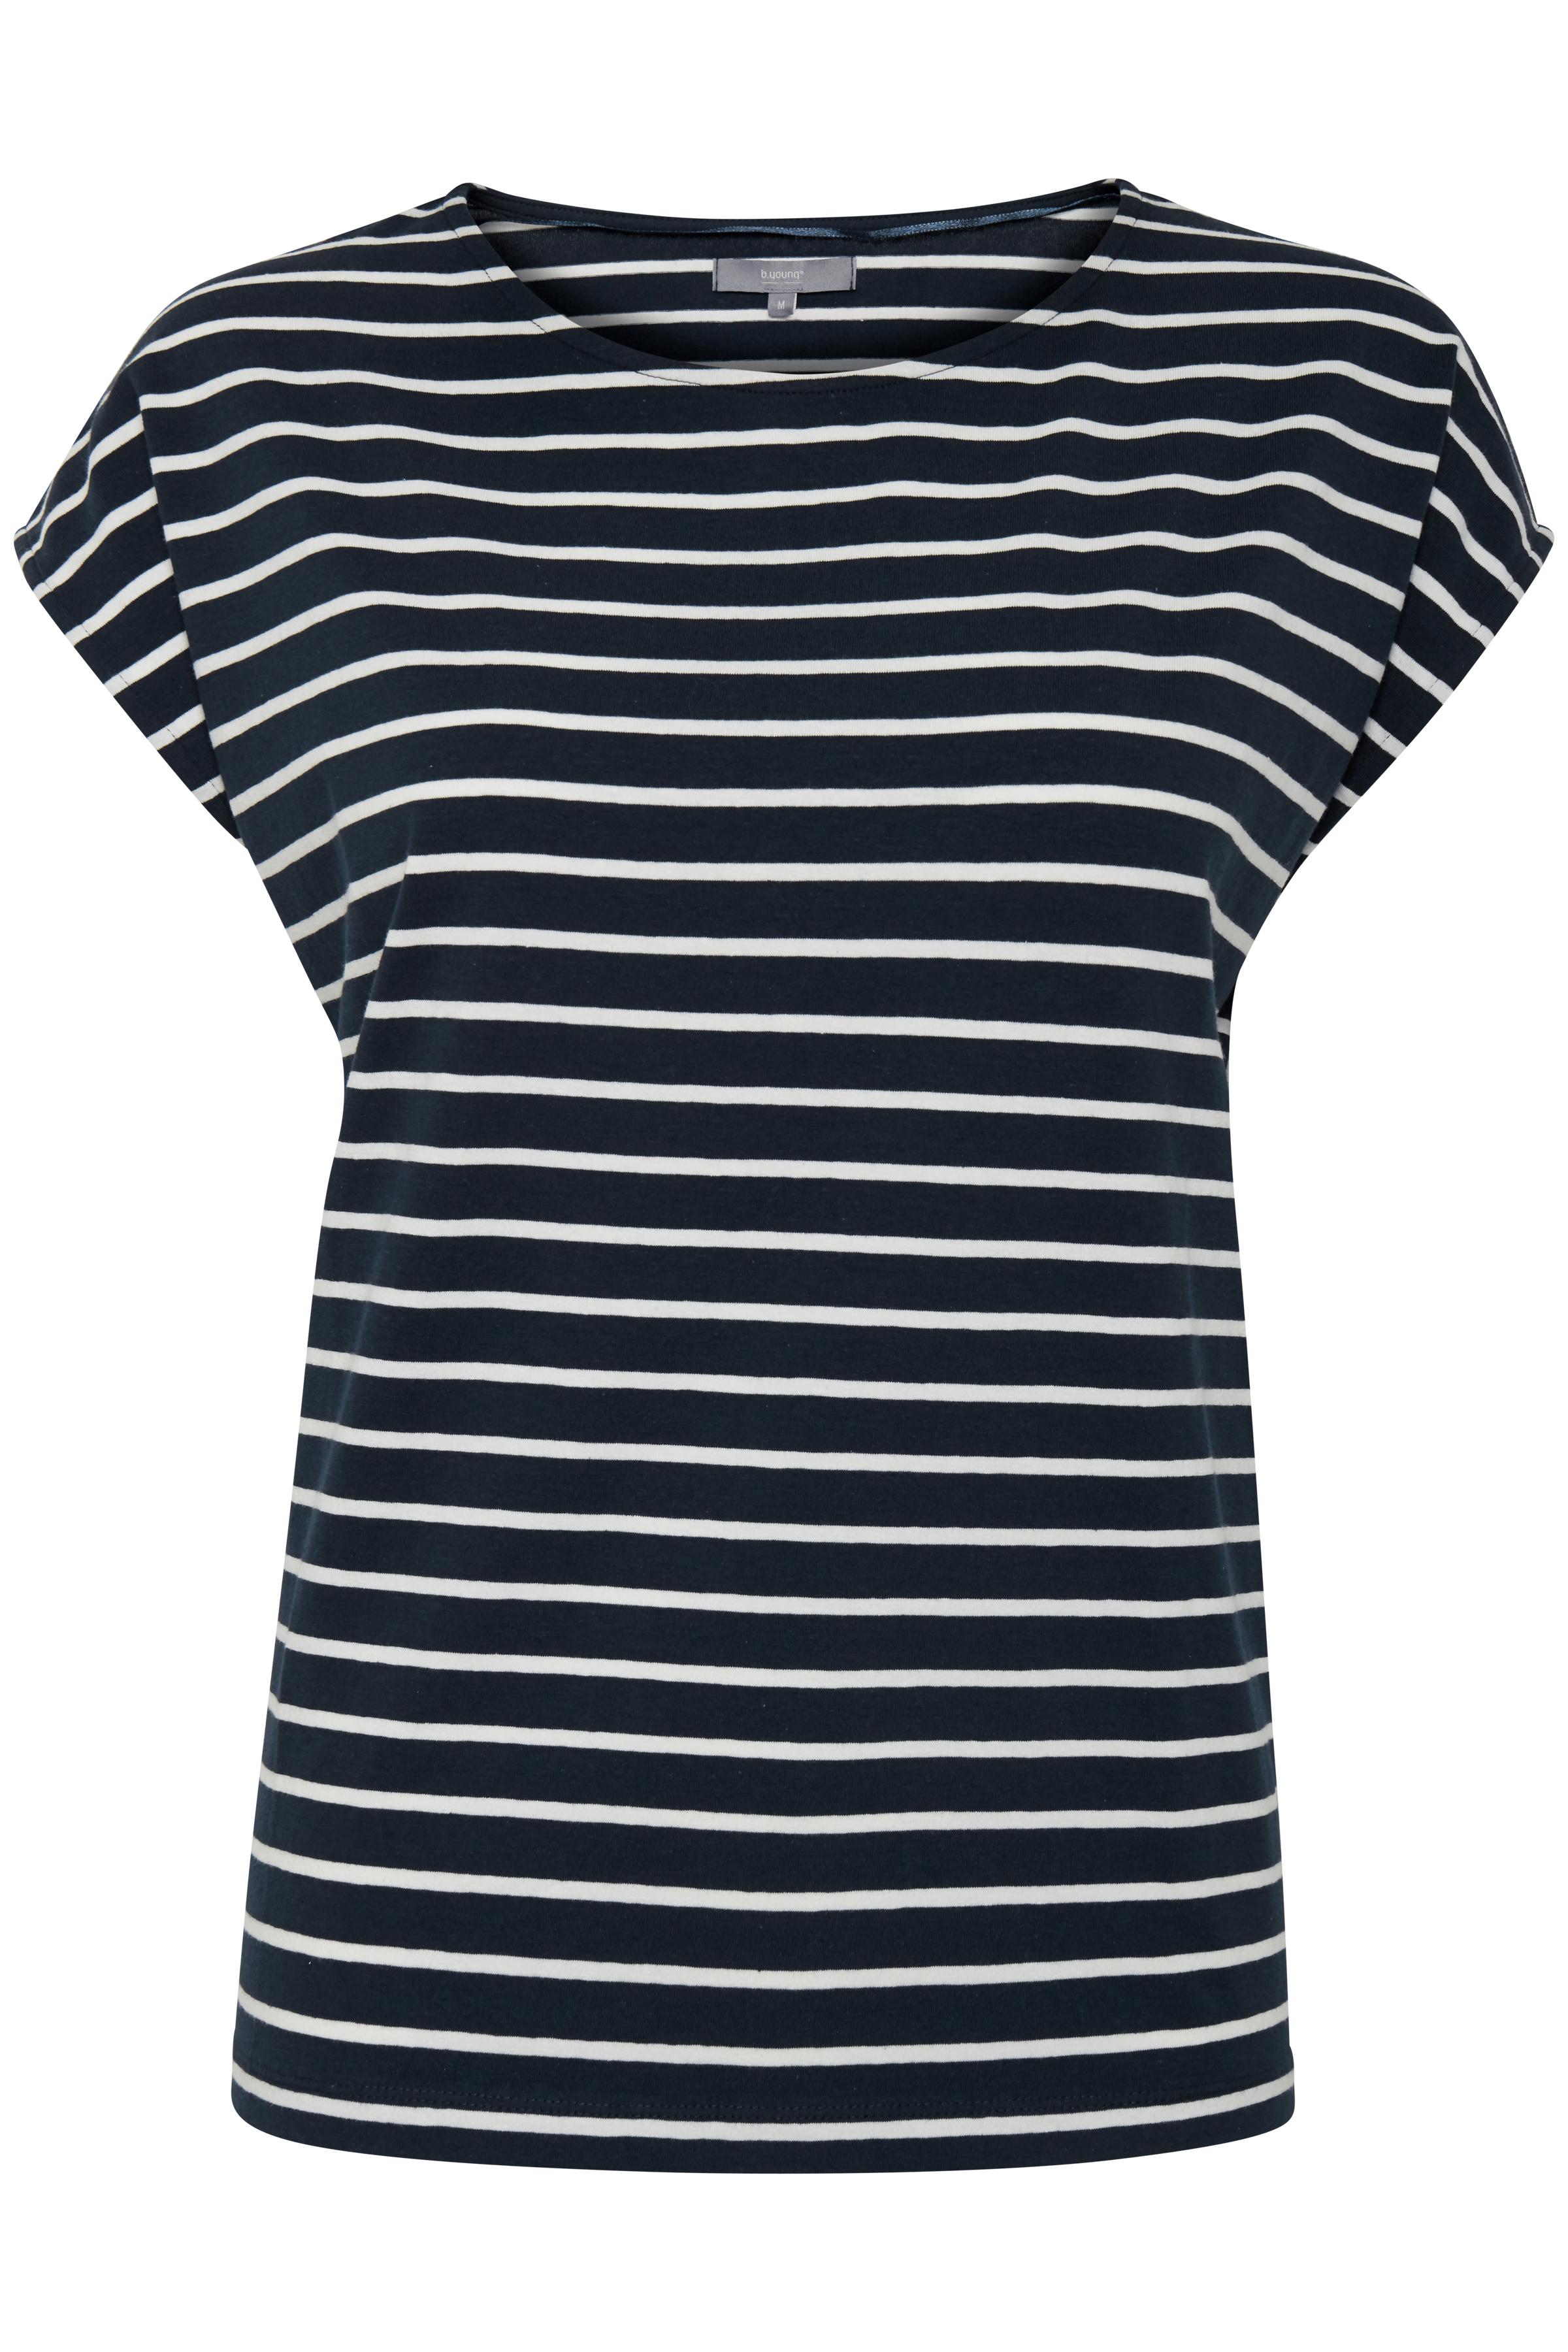 Image of b.young Dame T-shirt - Marineblå/hvid